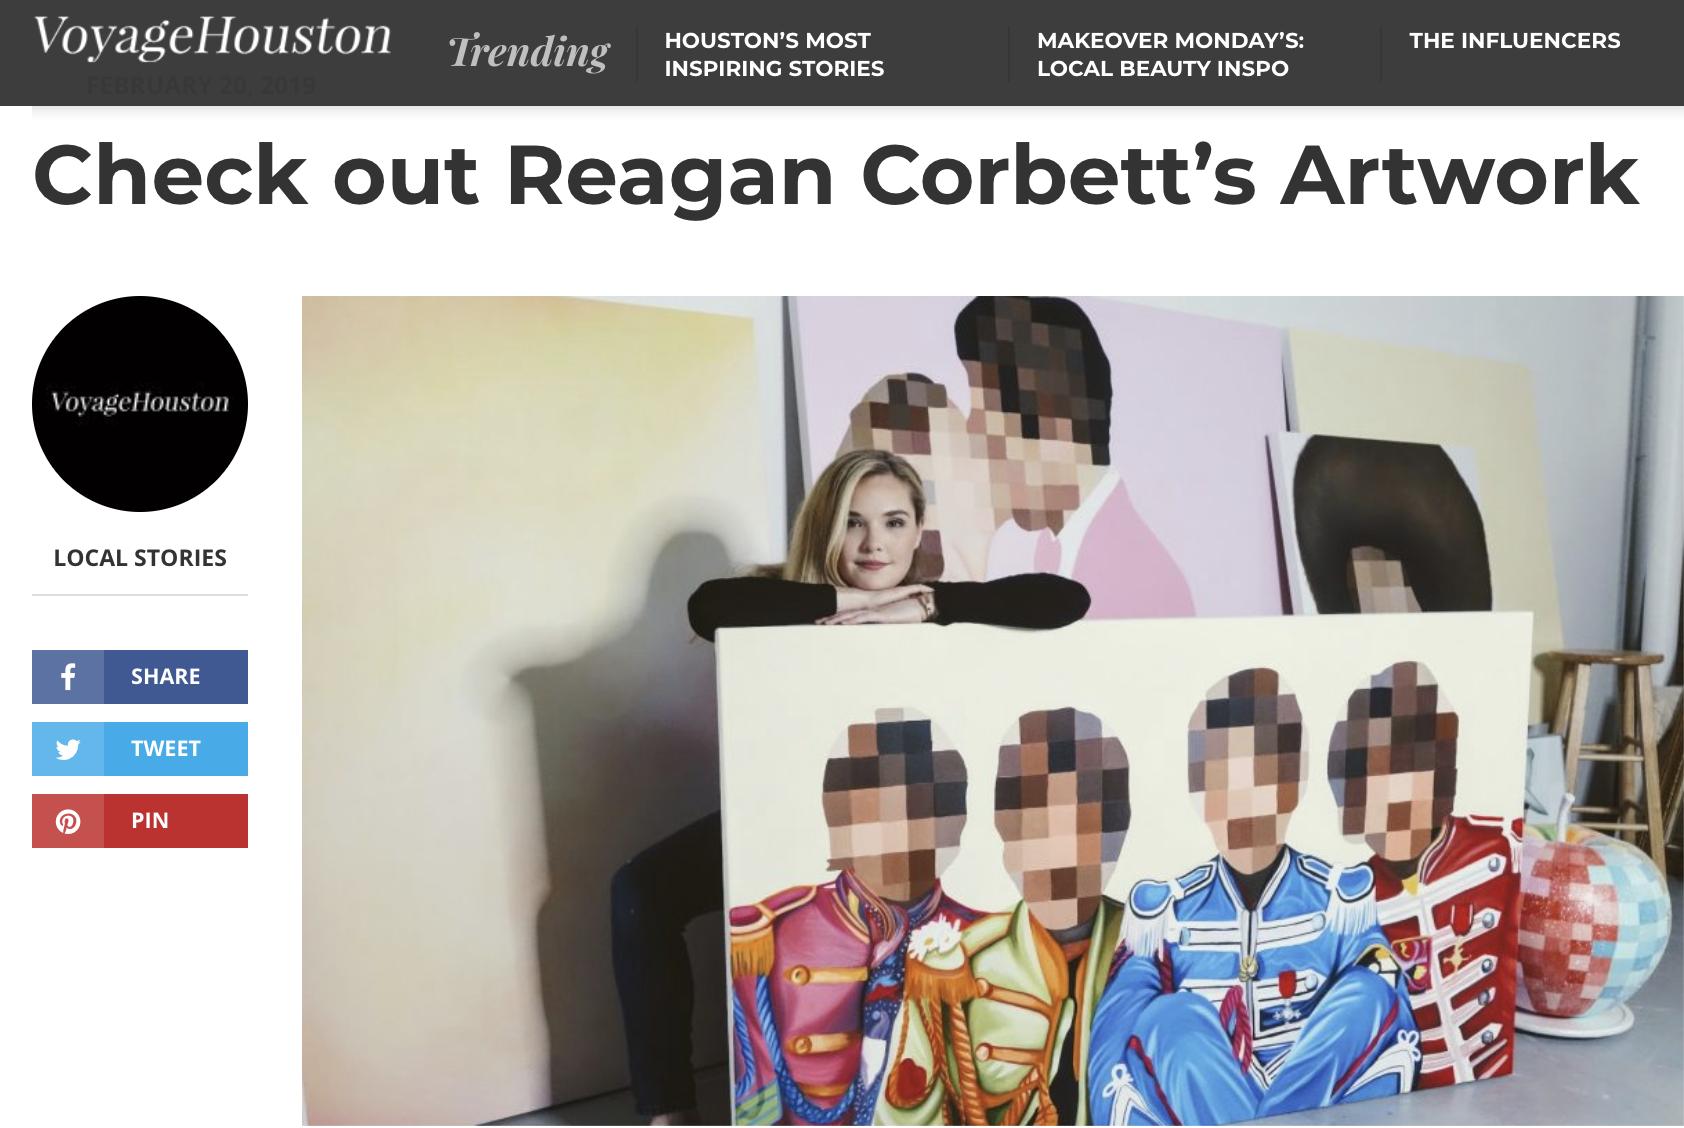 Voyage Houston - Houston's most inspiring stories: Check out Reagan Corbett's Artwork